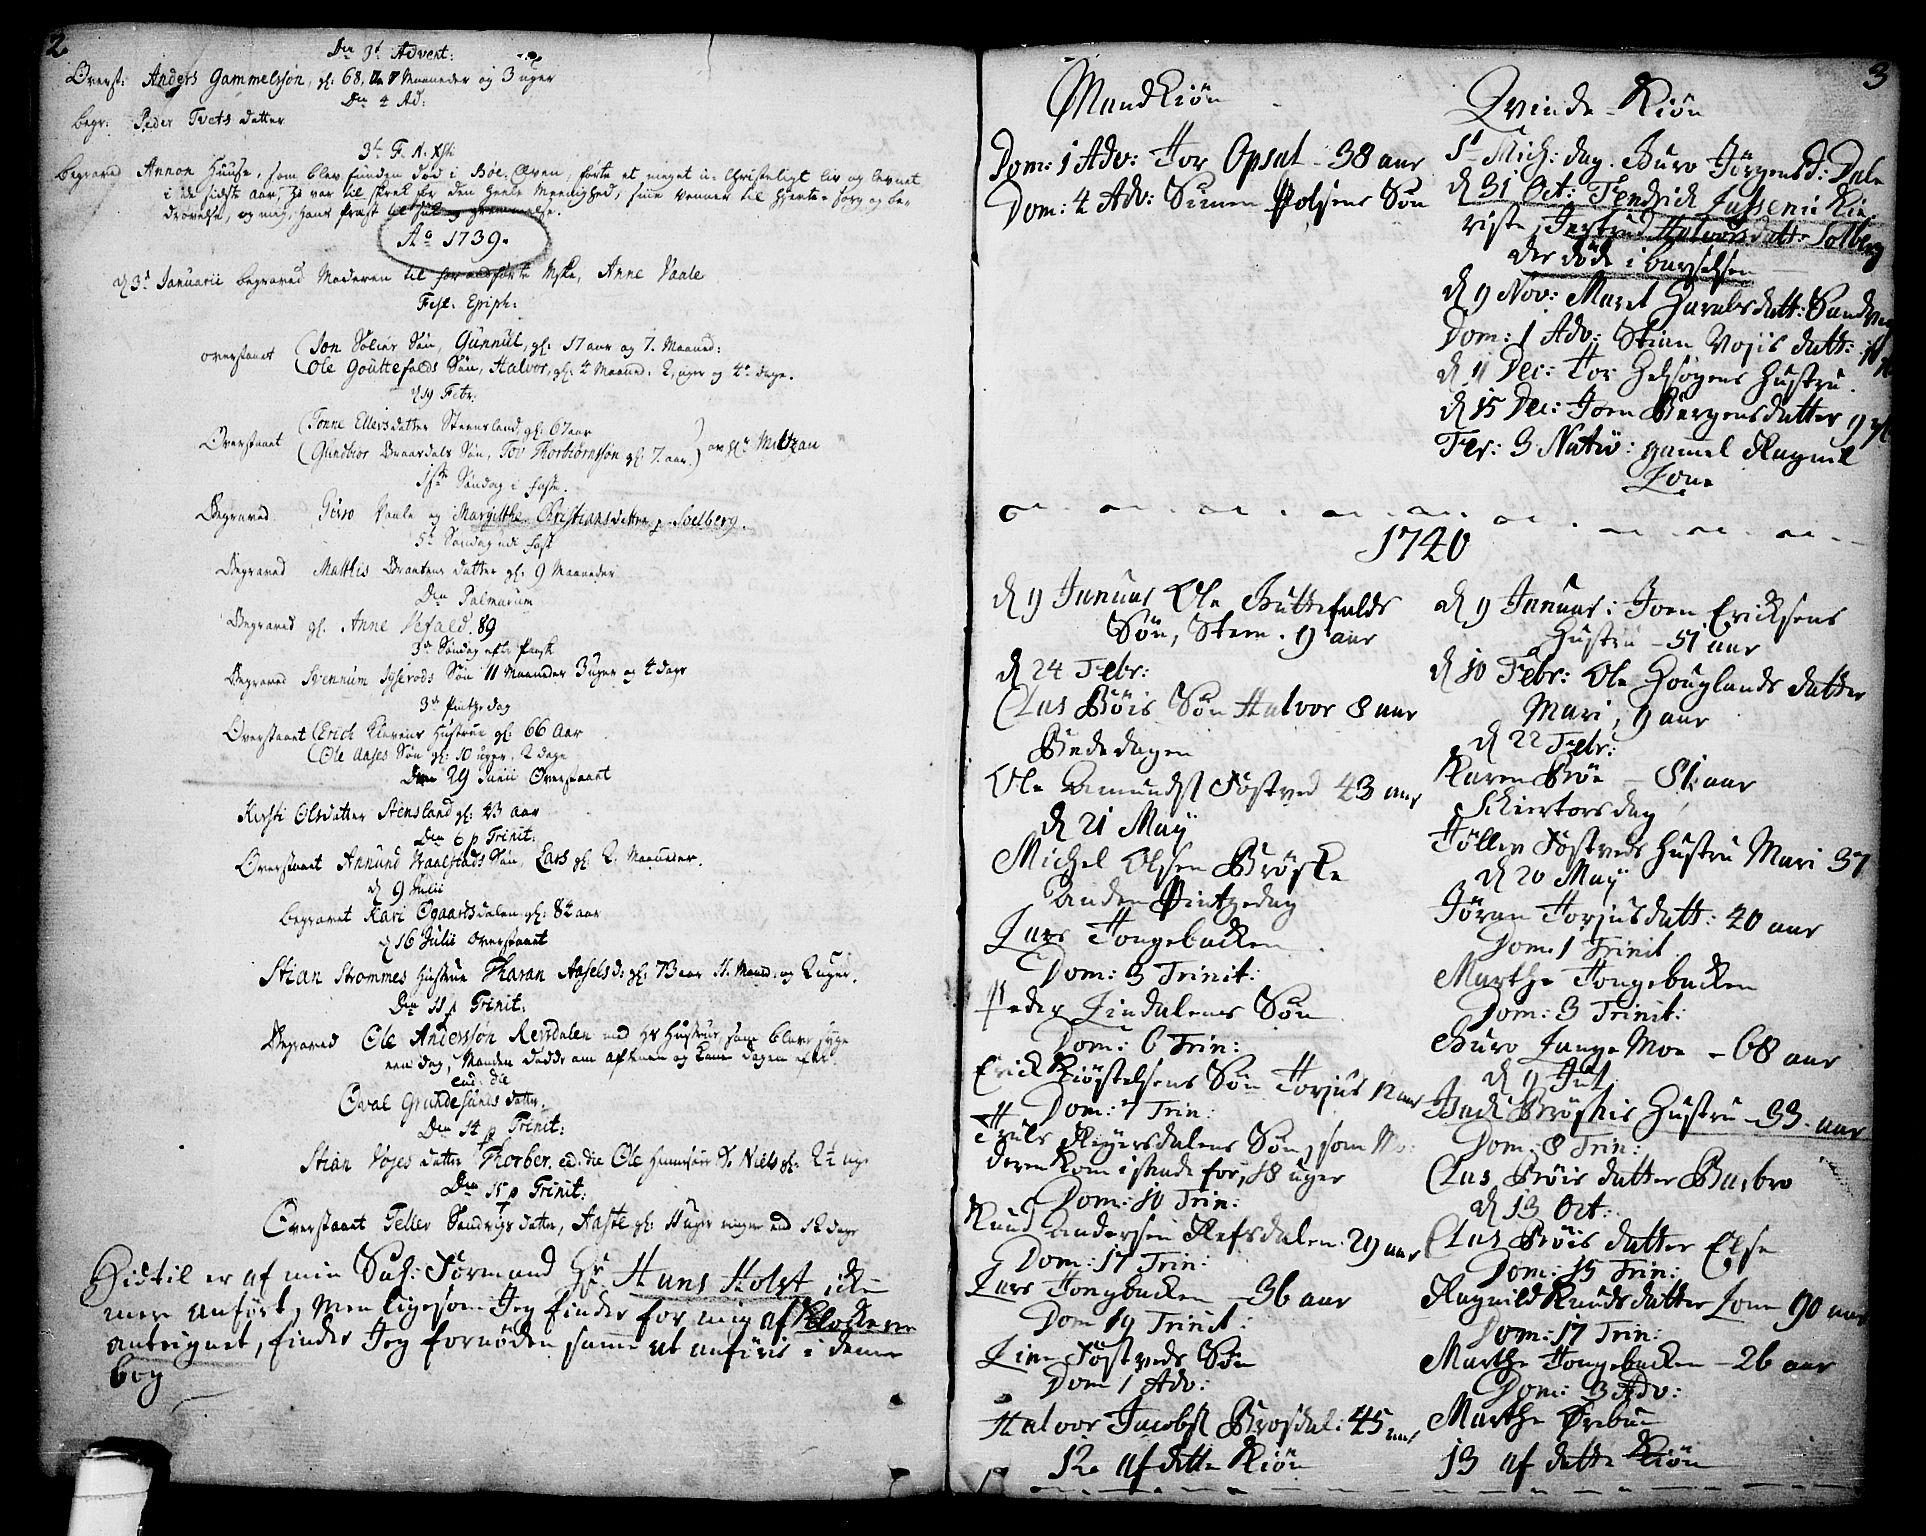 SAKO, Drangedal kirkebøker, F/Fa/L0001: Ministerialbok nr. 1, 1697-1767, s. 2-3